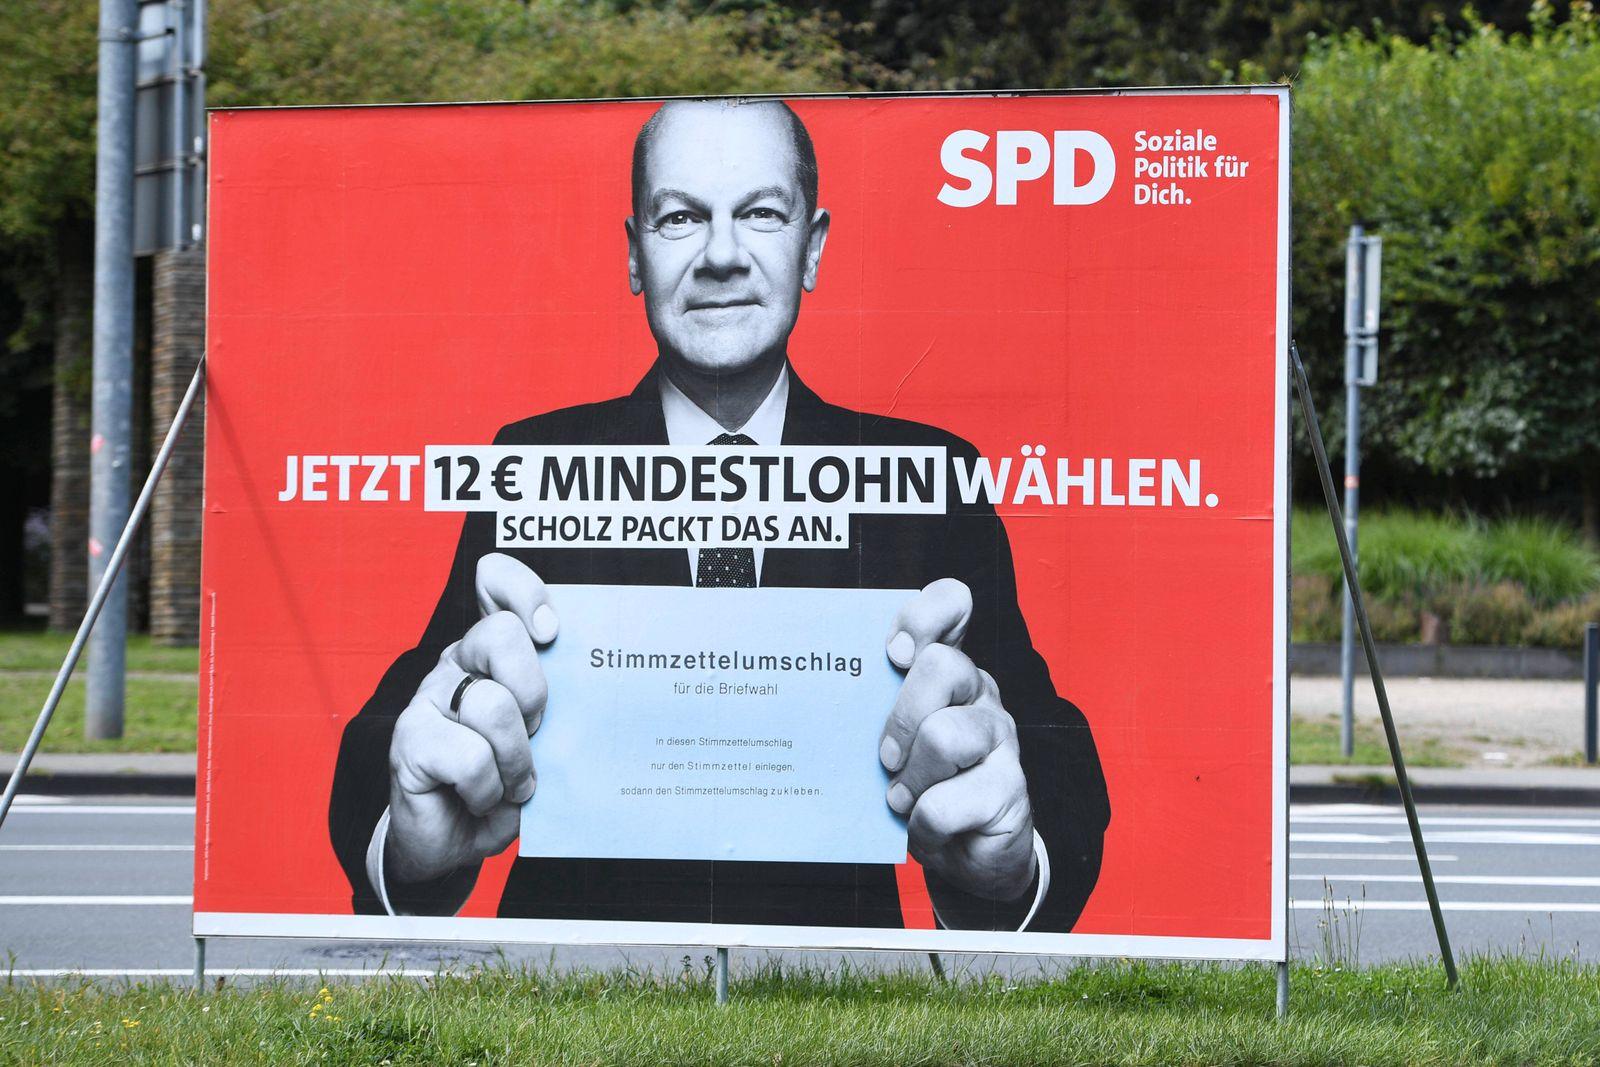 Wahlplakate - Bundestagswahl 2021 am 12.08.2021 in Oberhausen Ein Wahlplakat der SPD ( Sozialdemokratische Partei Deutsc